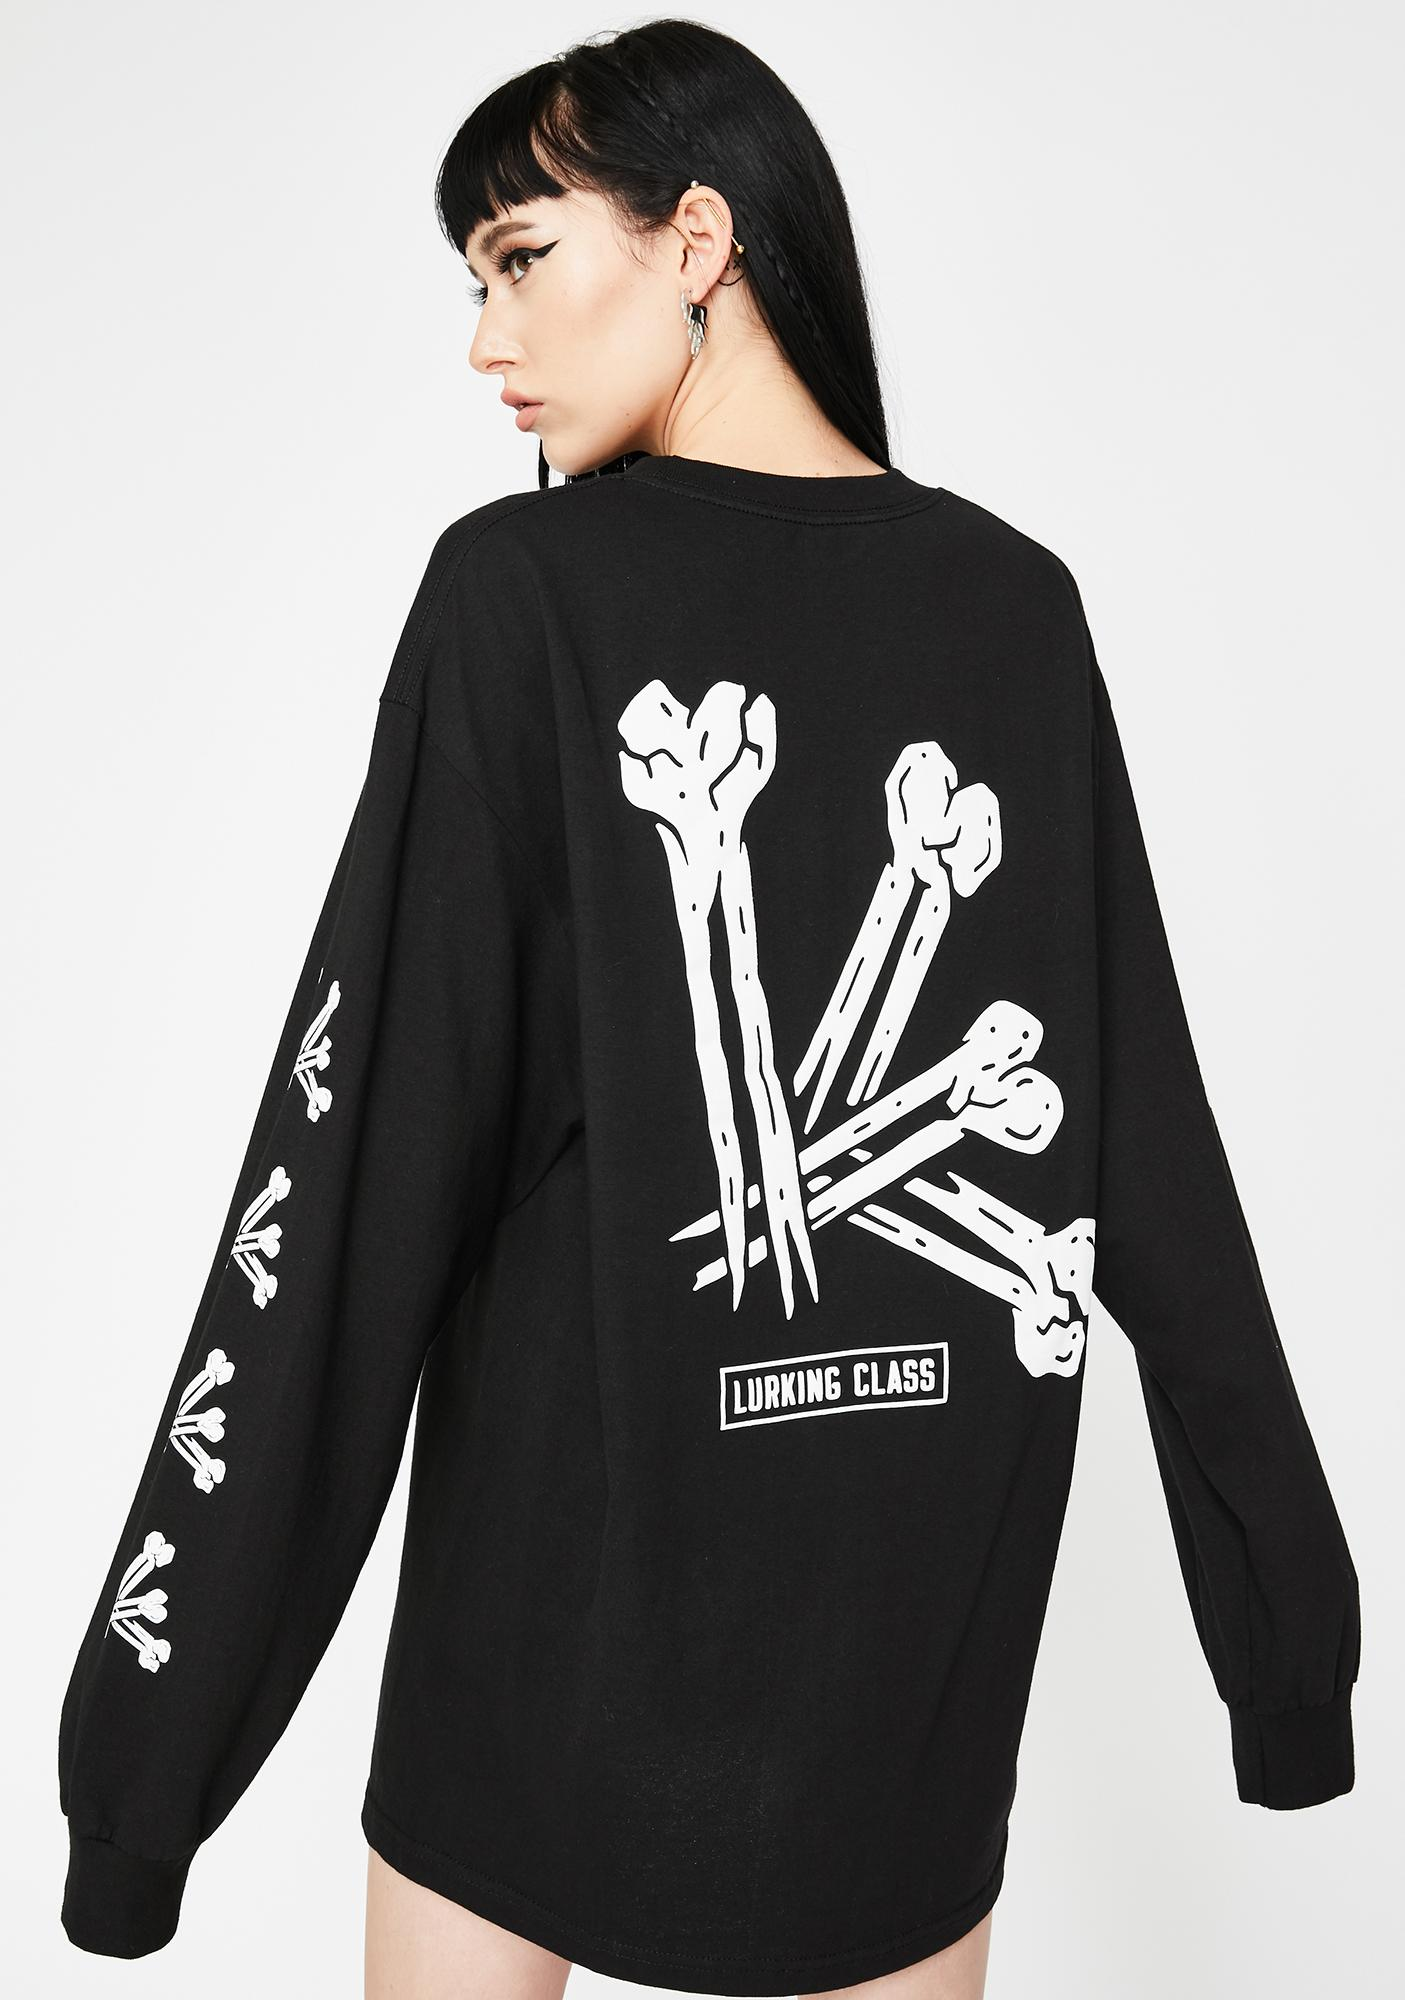 Lurking Class Bones Long Sleeve Graphic Tee